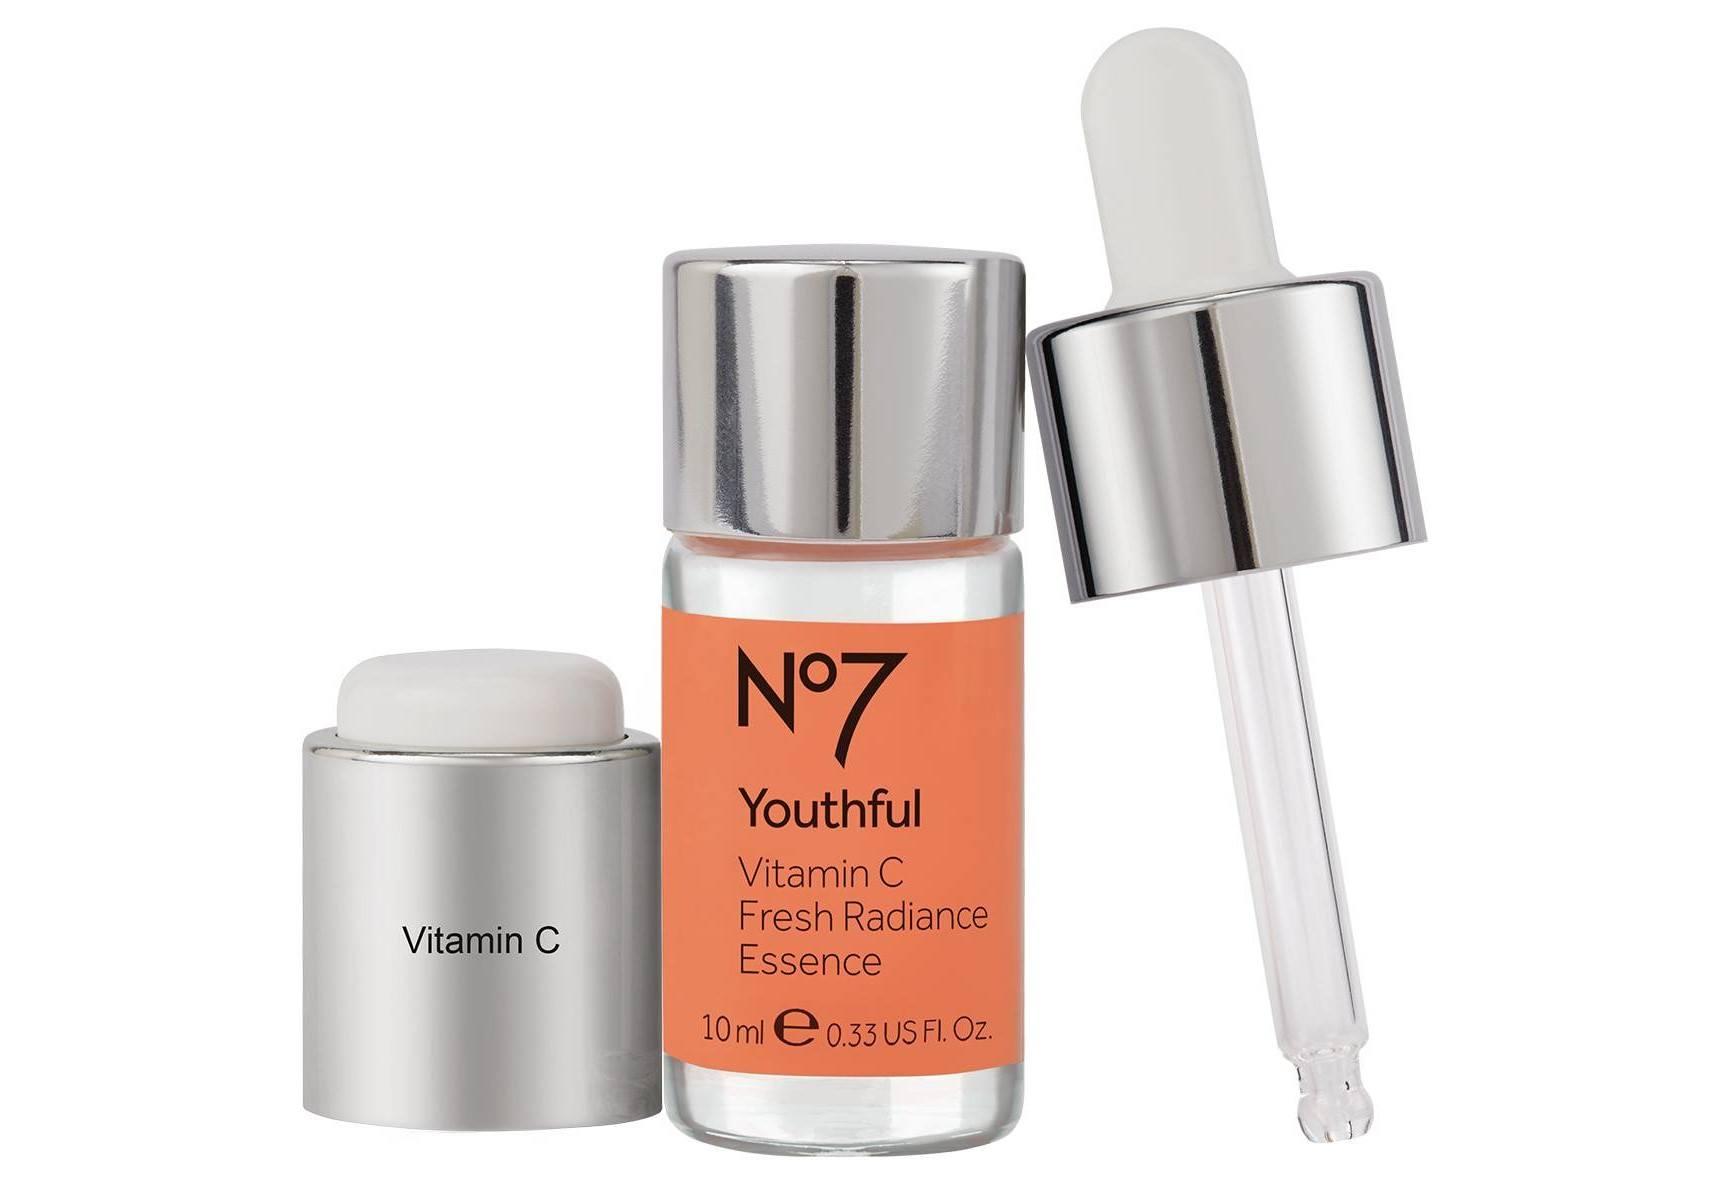 N7-Vitamin-C-Essence